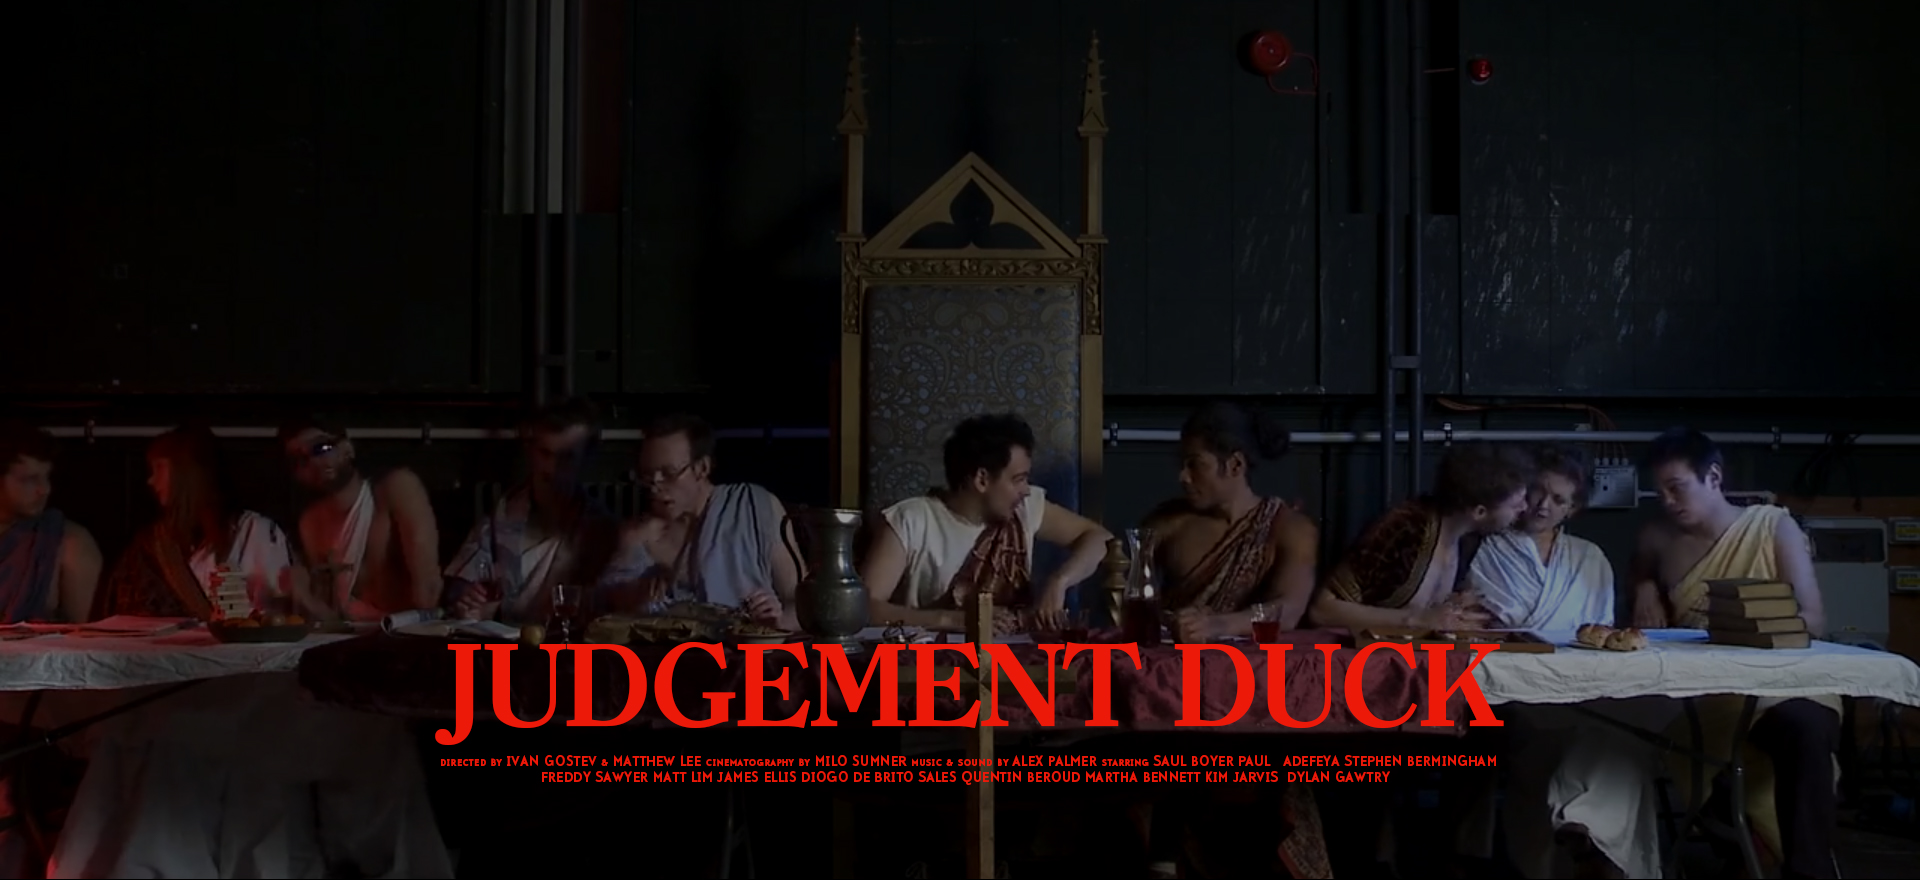 Judgement Duck (2016)